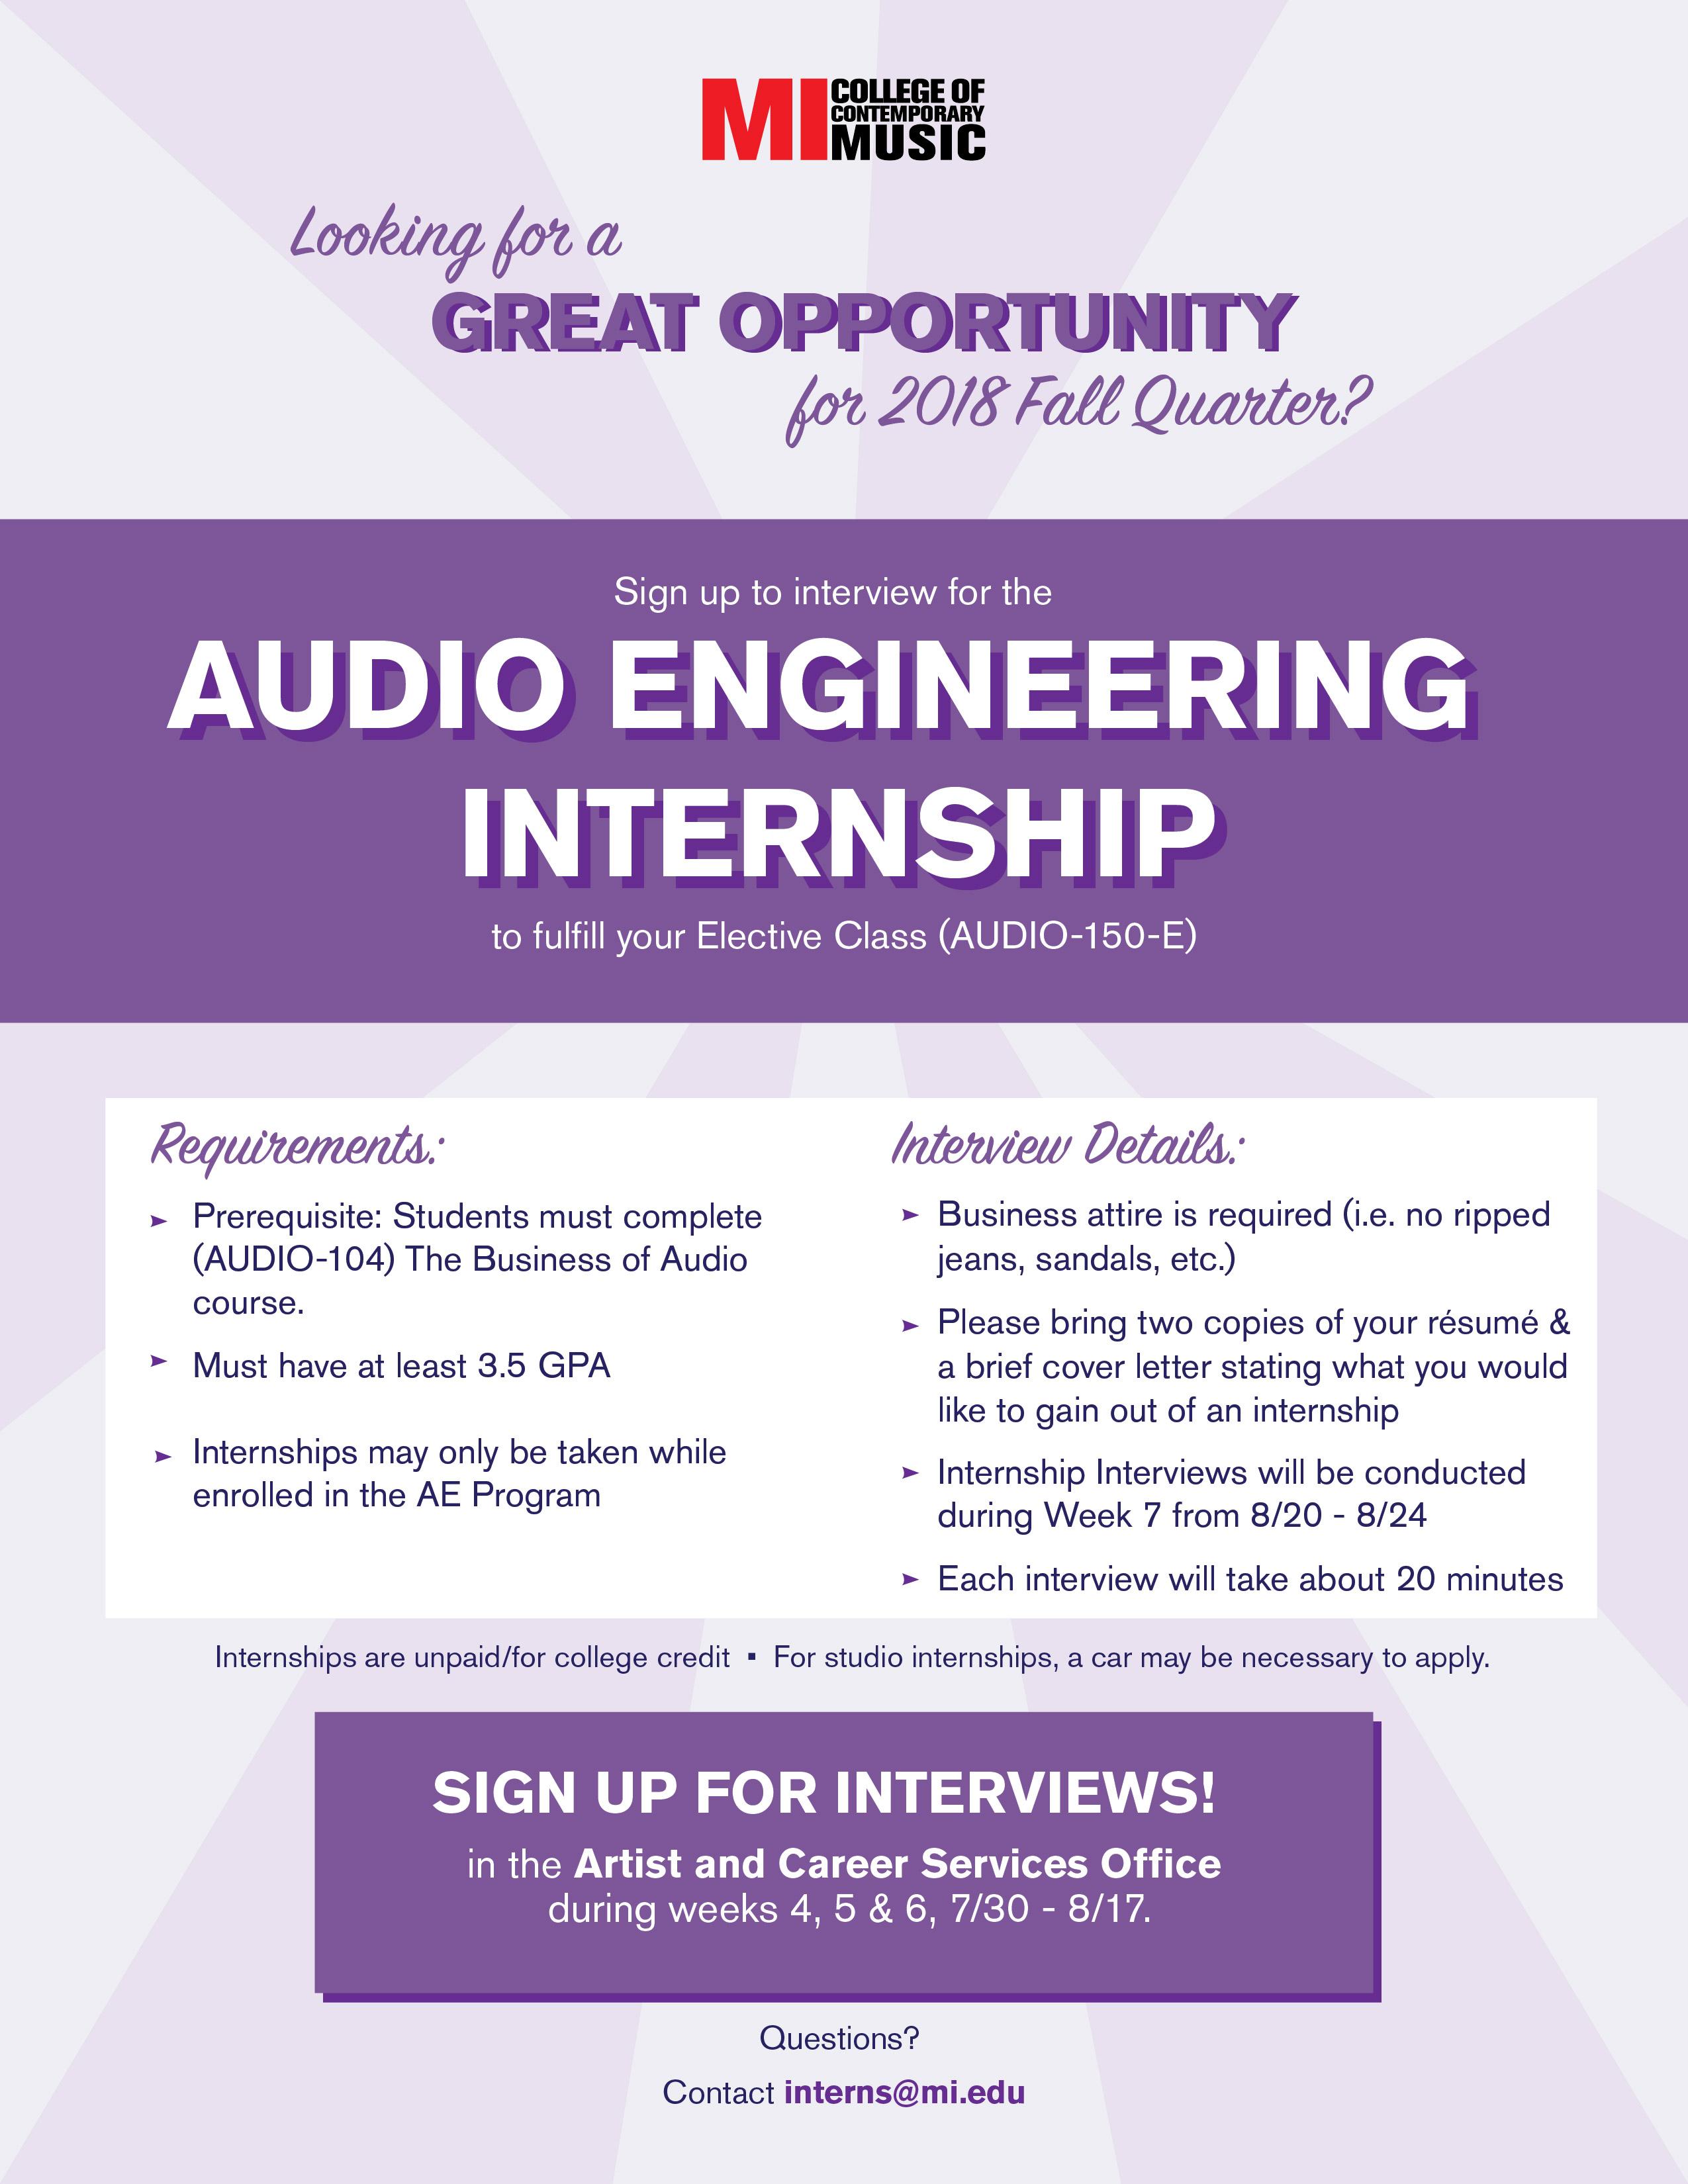 AUDIO ENGINEERING INTERNSHIP MONDAY, JULY 30, 8:30AM – FRIDAY, AUGUST 17, 2018, 5PM